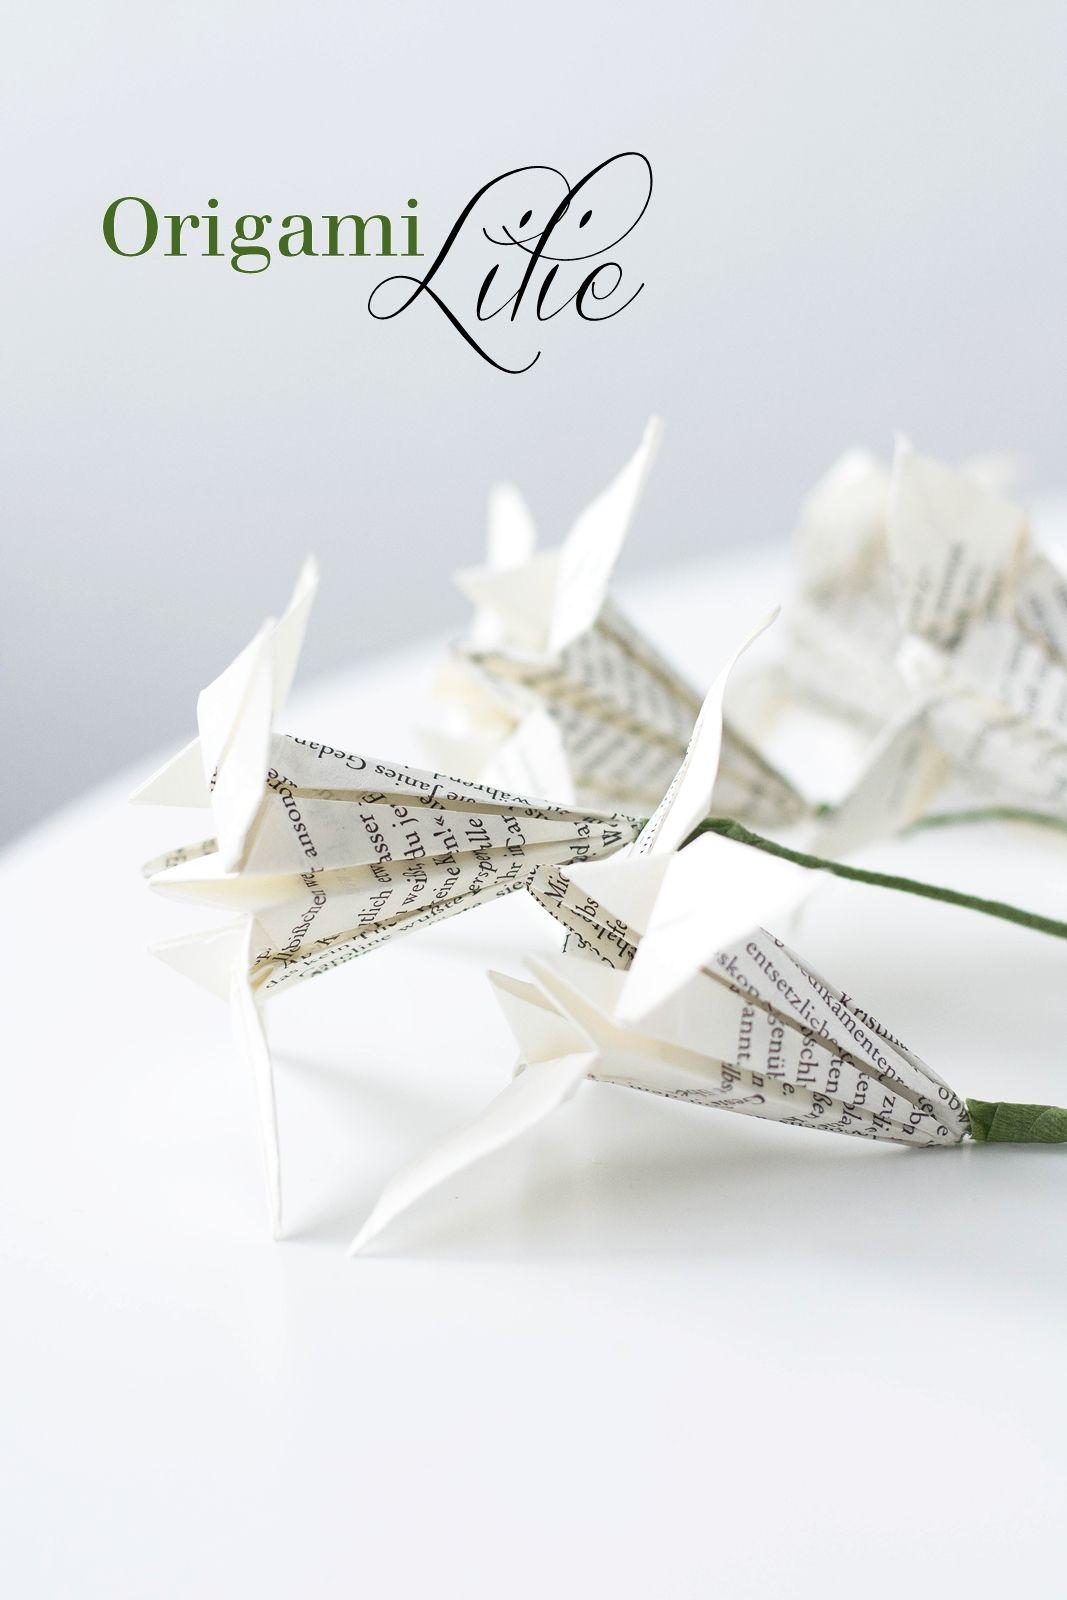 papierblumen falten origami lilien corner shelves origami papier origami anleitungen. Black Bedroom Furniture Sets. Home Design Ideas